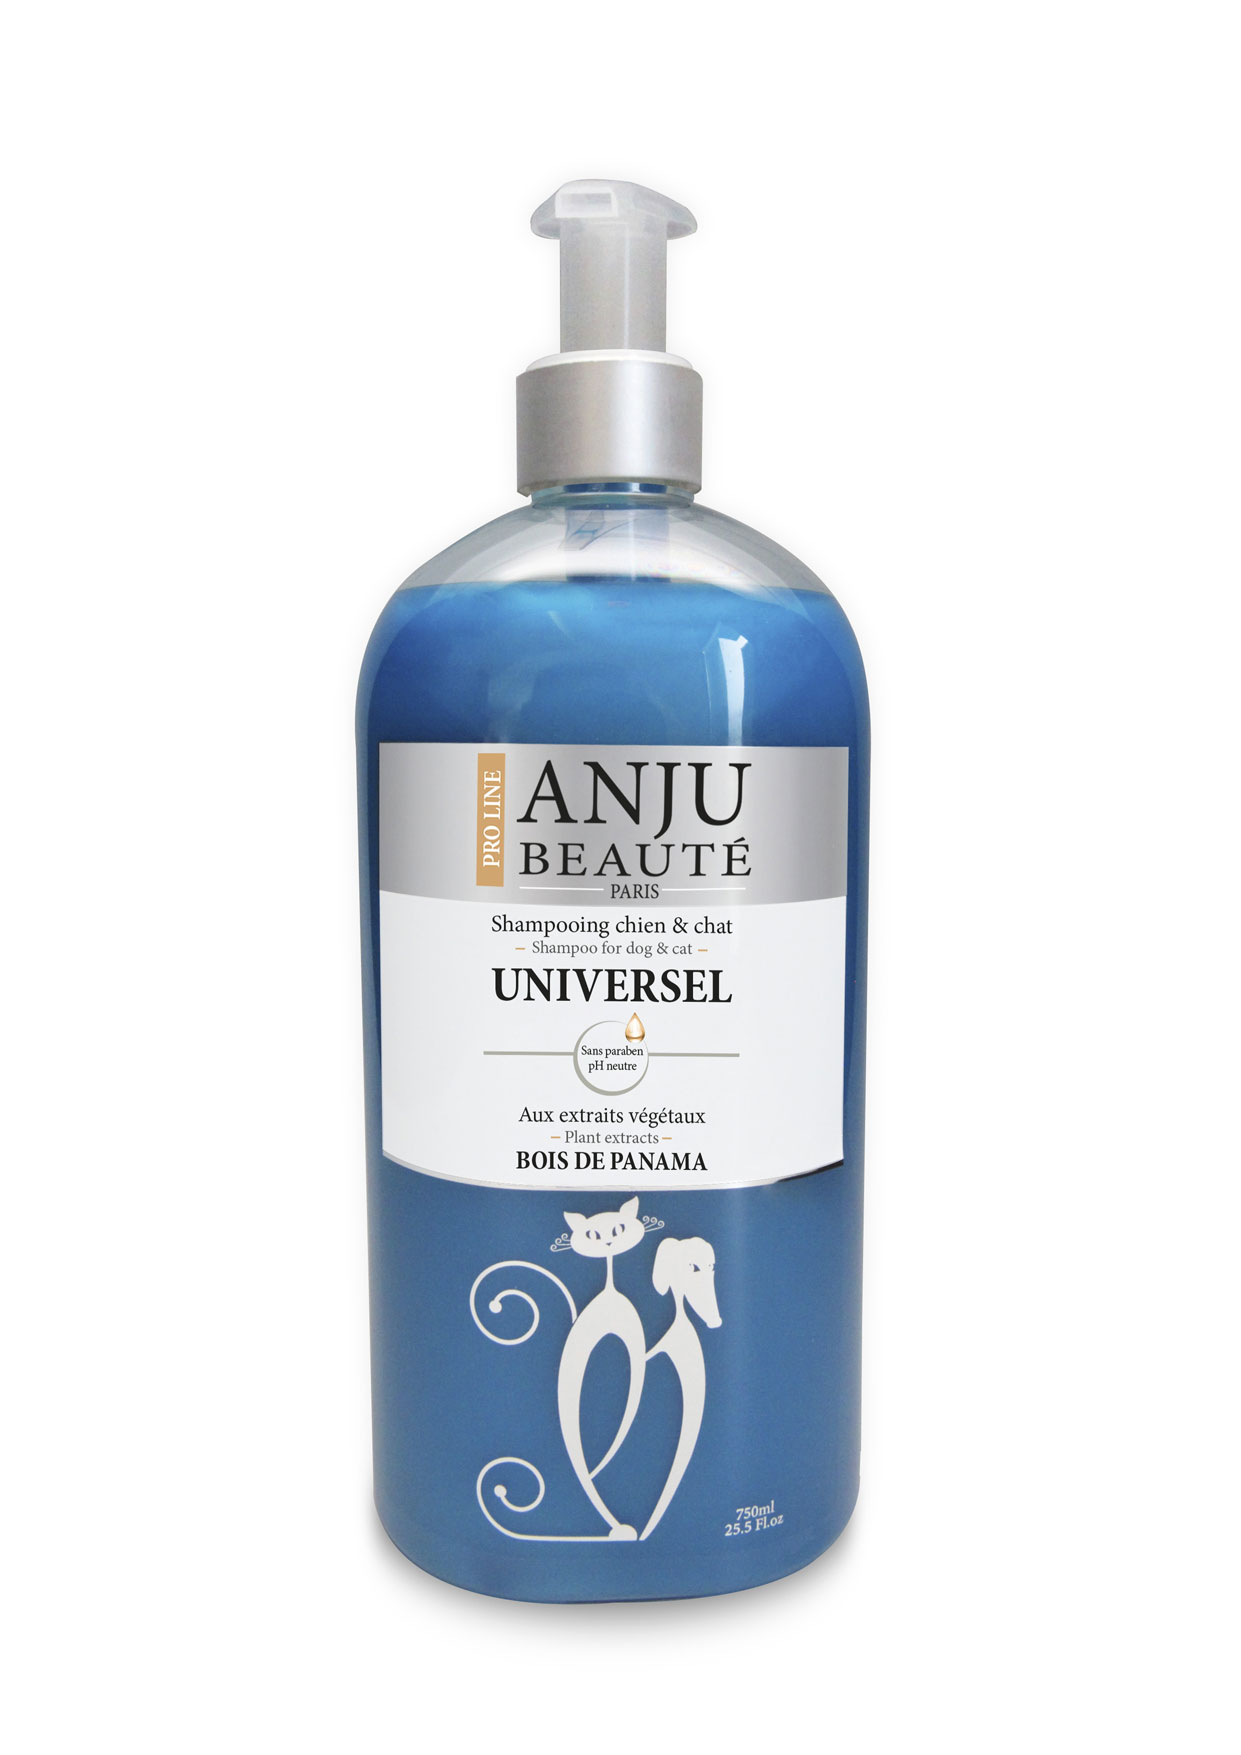 Shampoing ANJU Beauté universel 750 ML